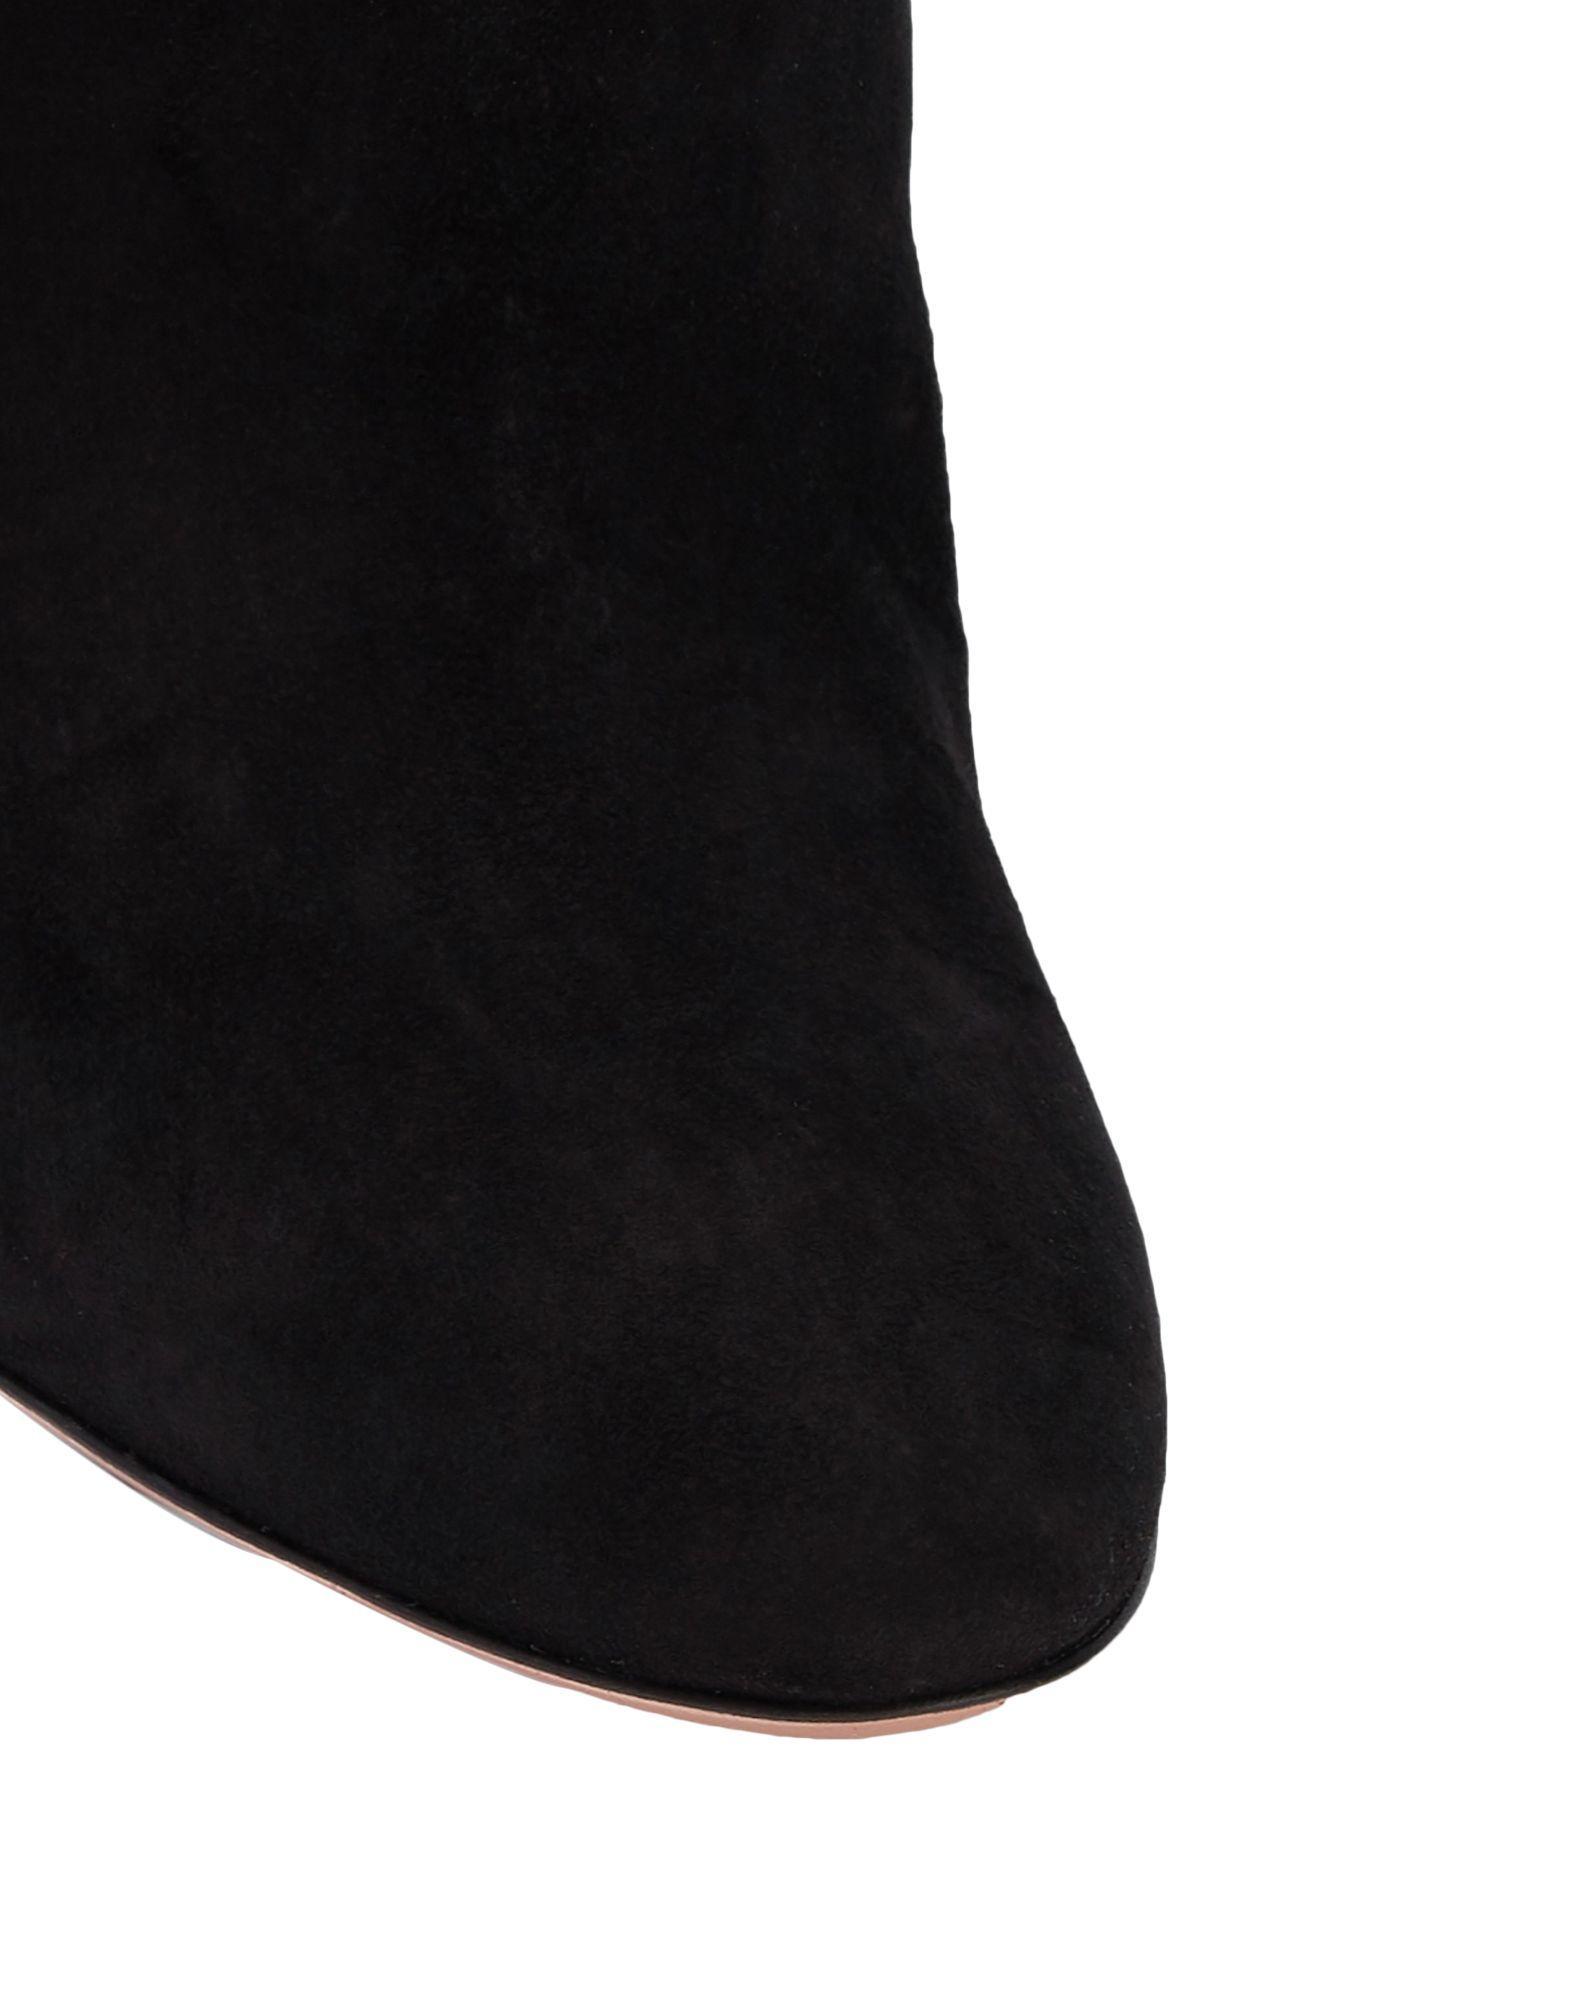 Botines de caña alta Aquazzura de Ante de color Negro